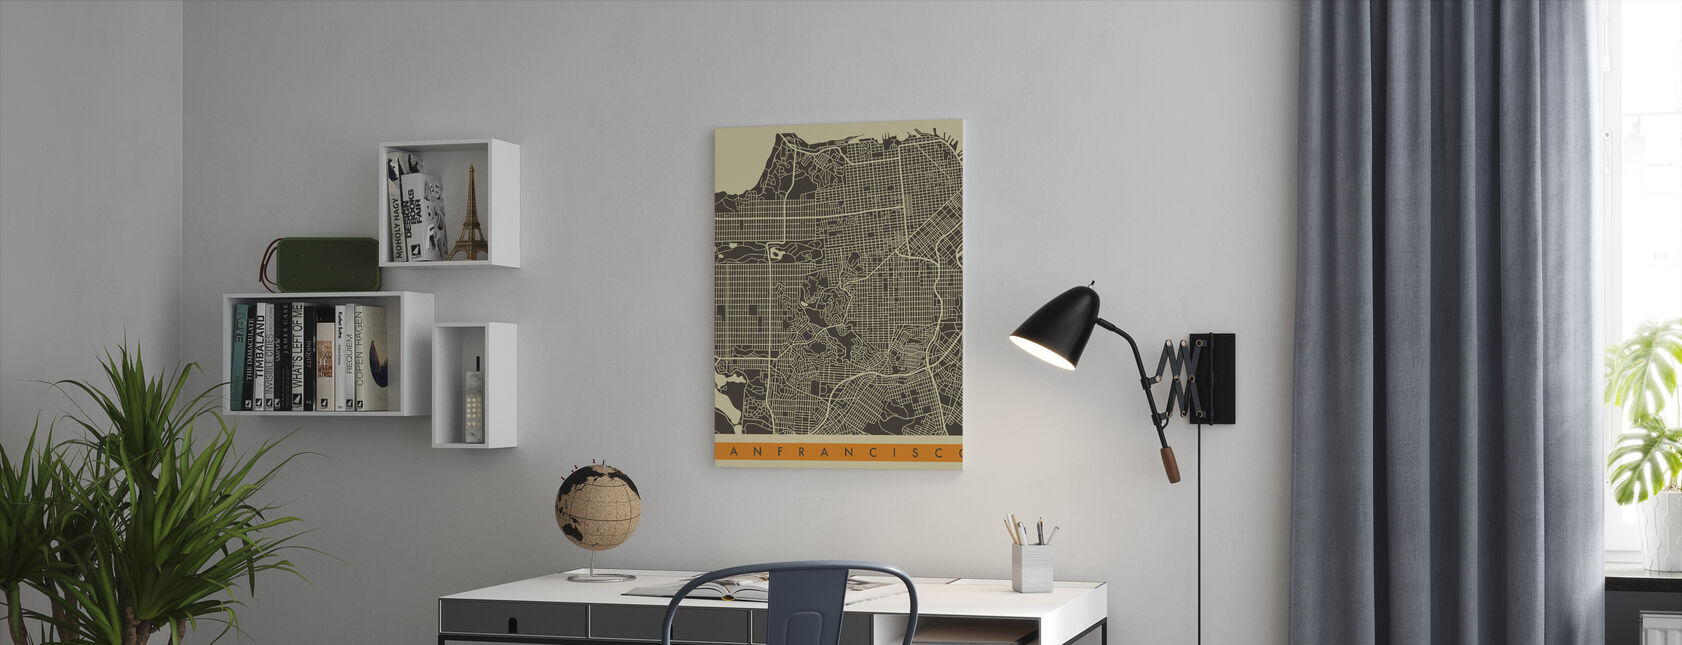 Bykart - San Francisco - Lerretsbilde - Kontor